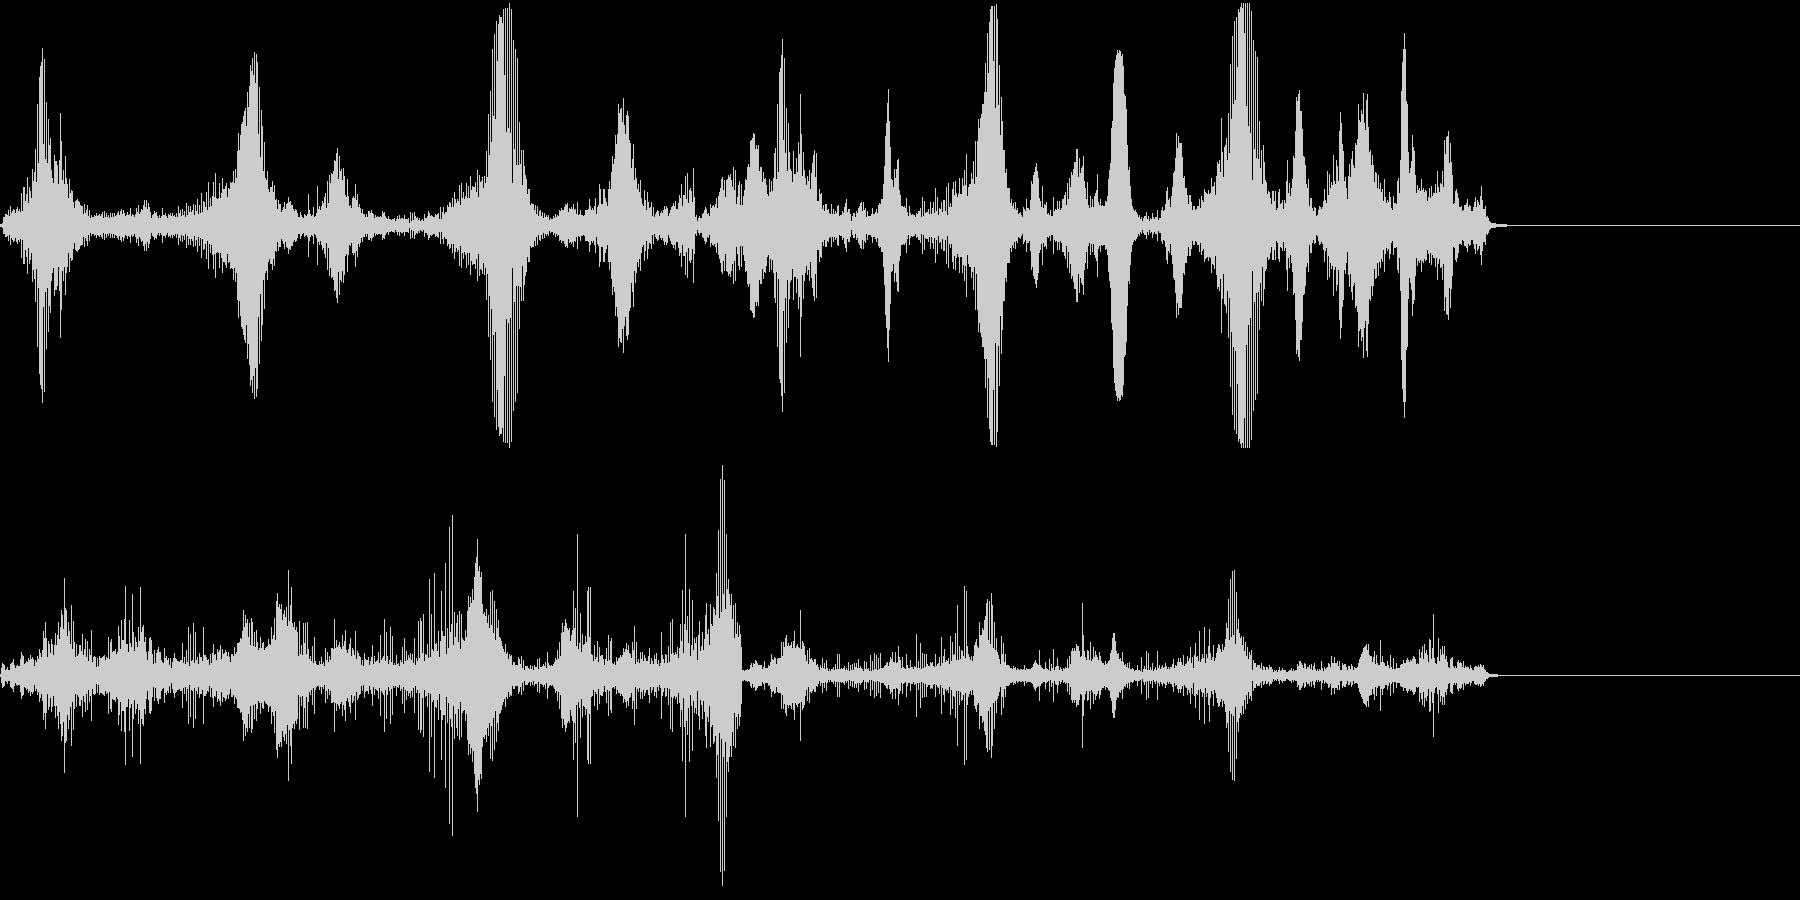 【SE 効果音】不気味な音6の未再生の波形